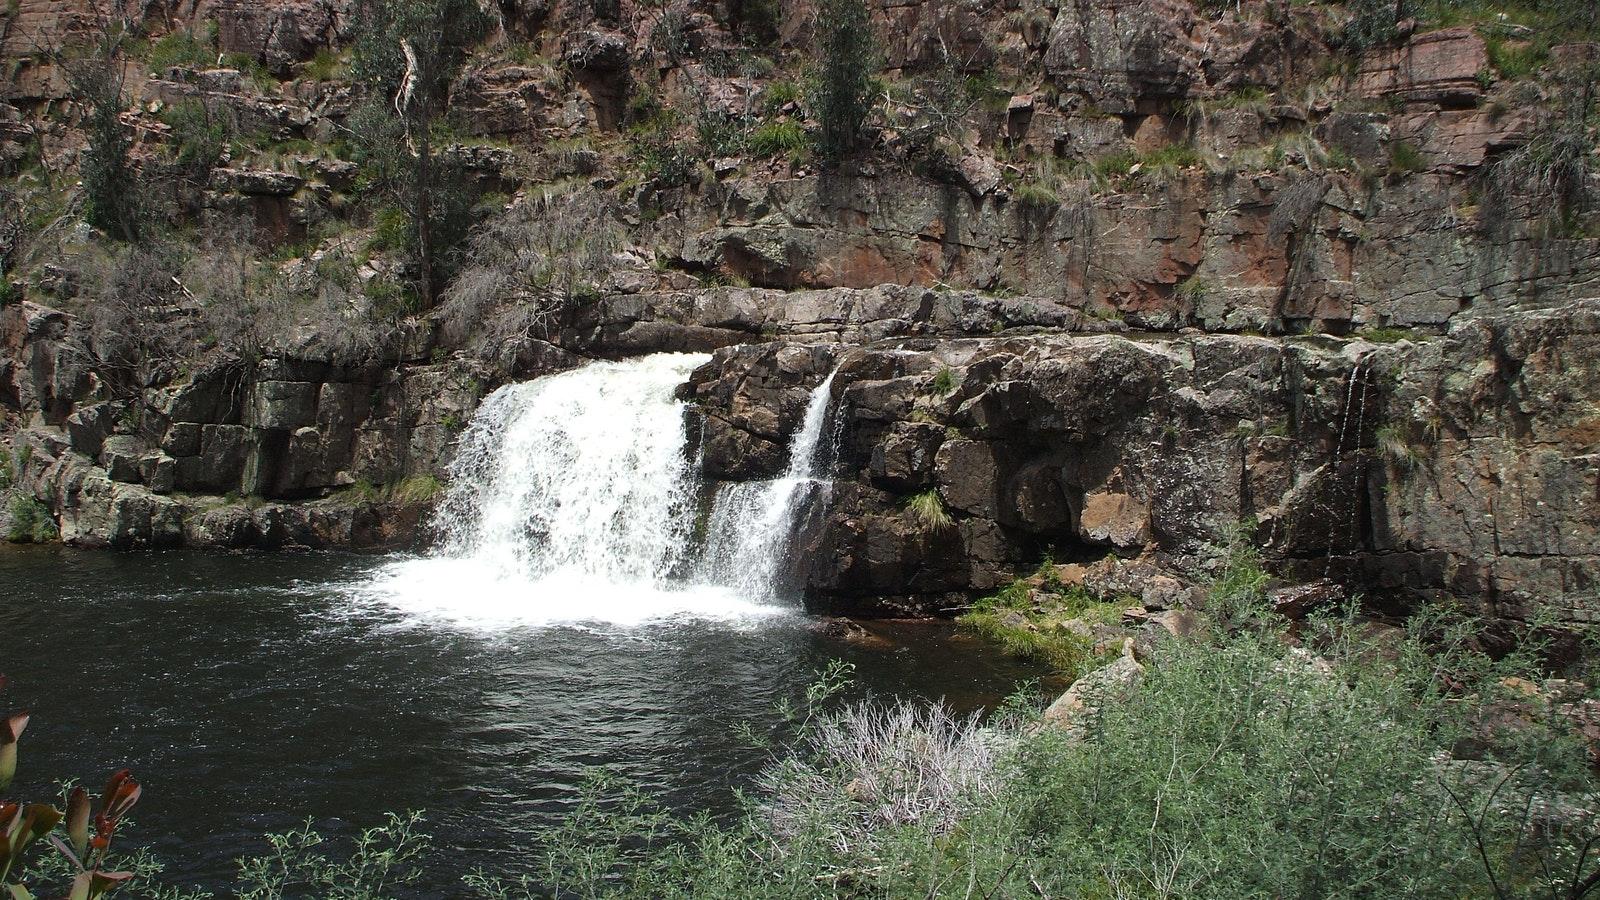 Waterfalls - Moroka Falls, Alpine National Park